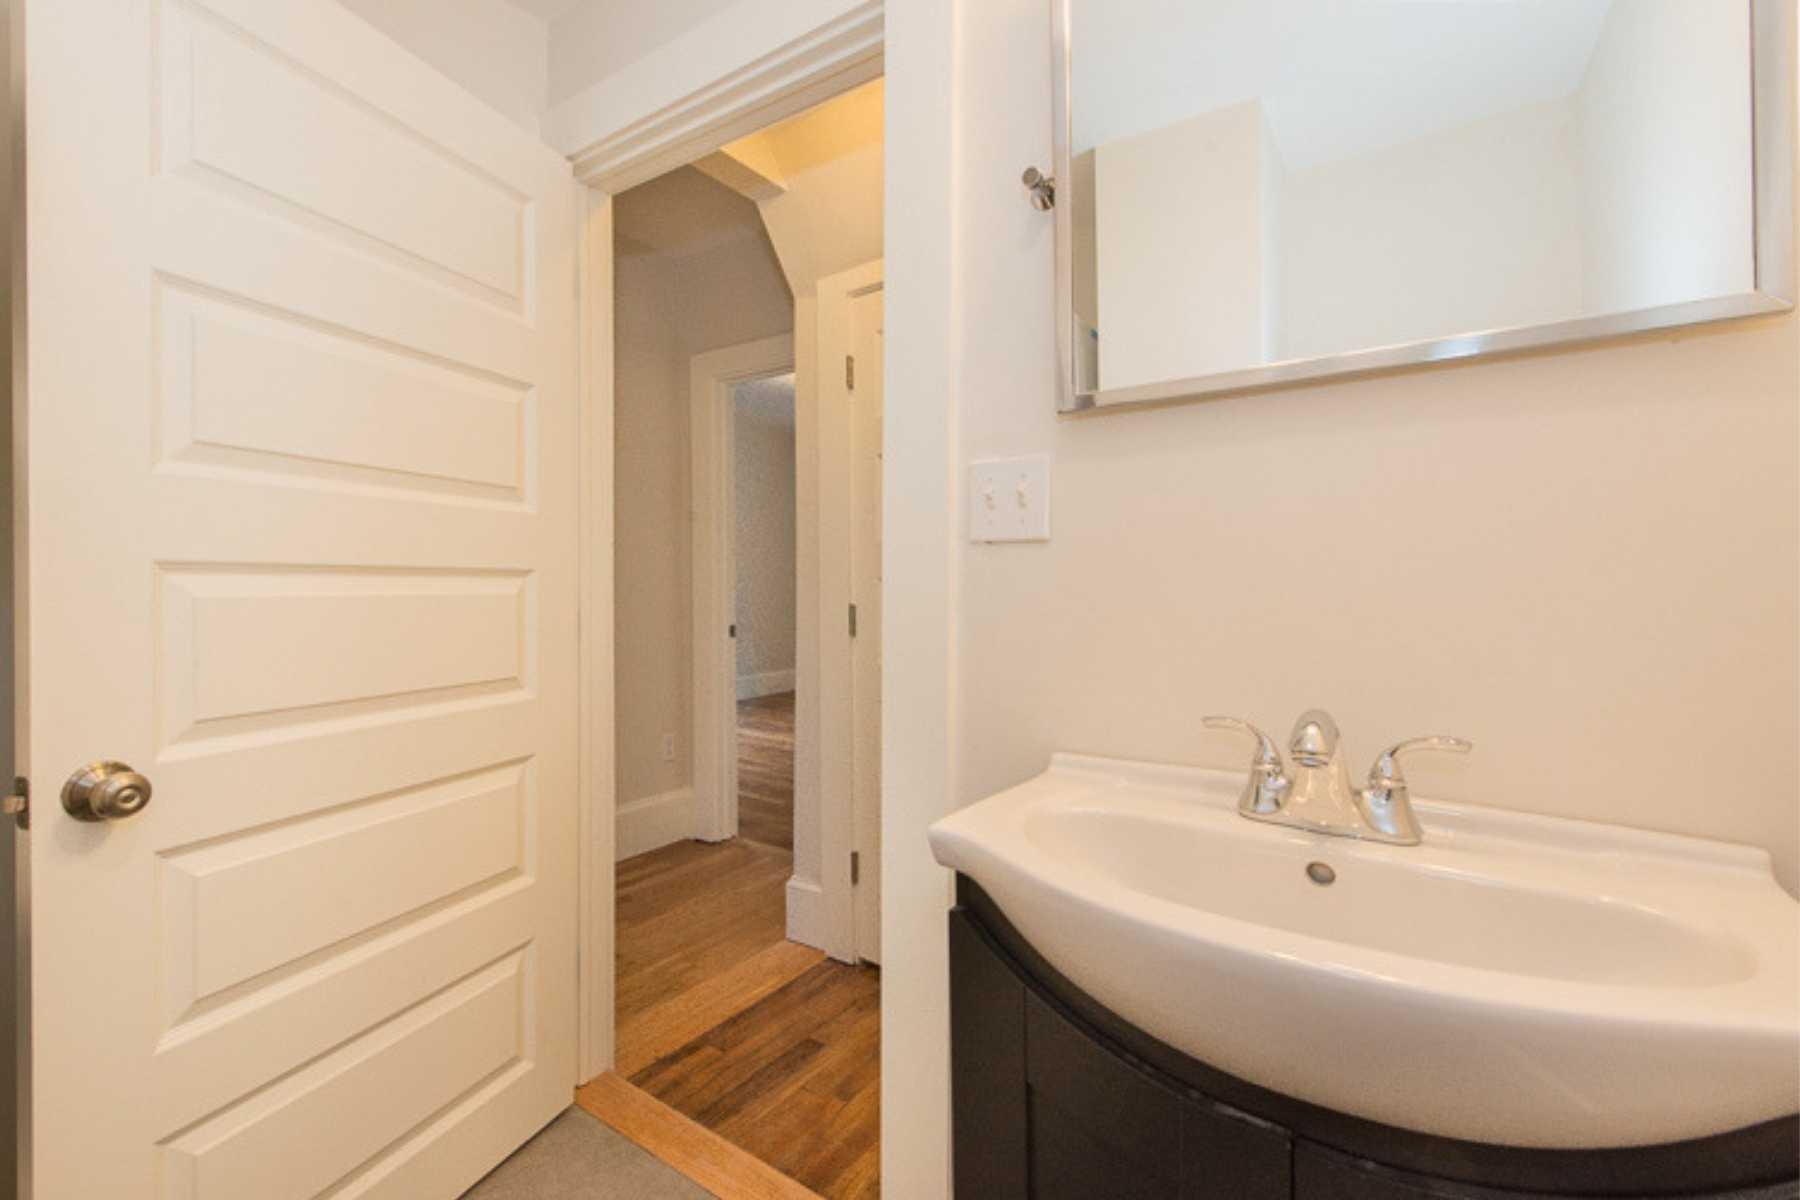 8-CapstoneCommunities-property-Riverside-Place-Apartments-Cambridge.jpg